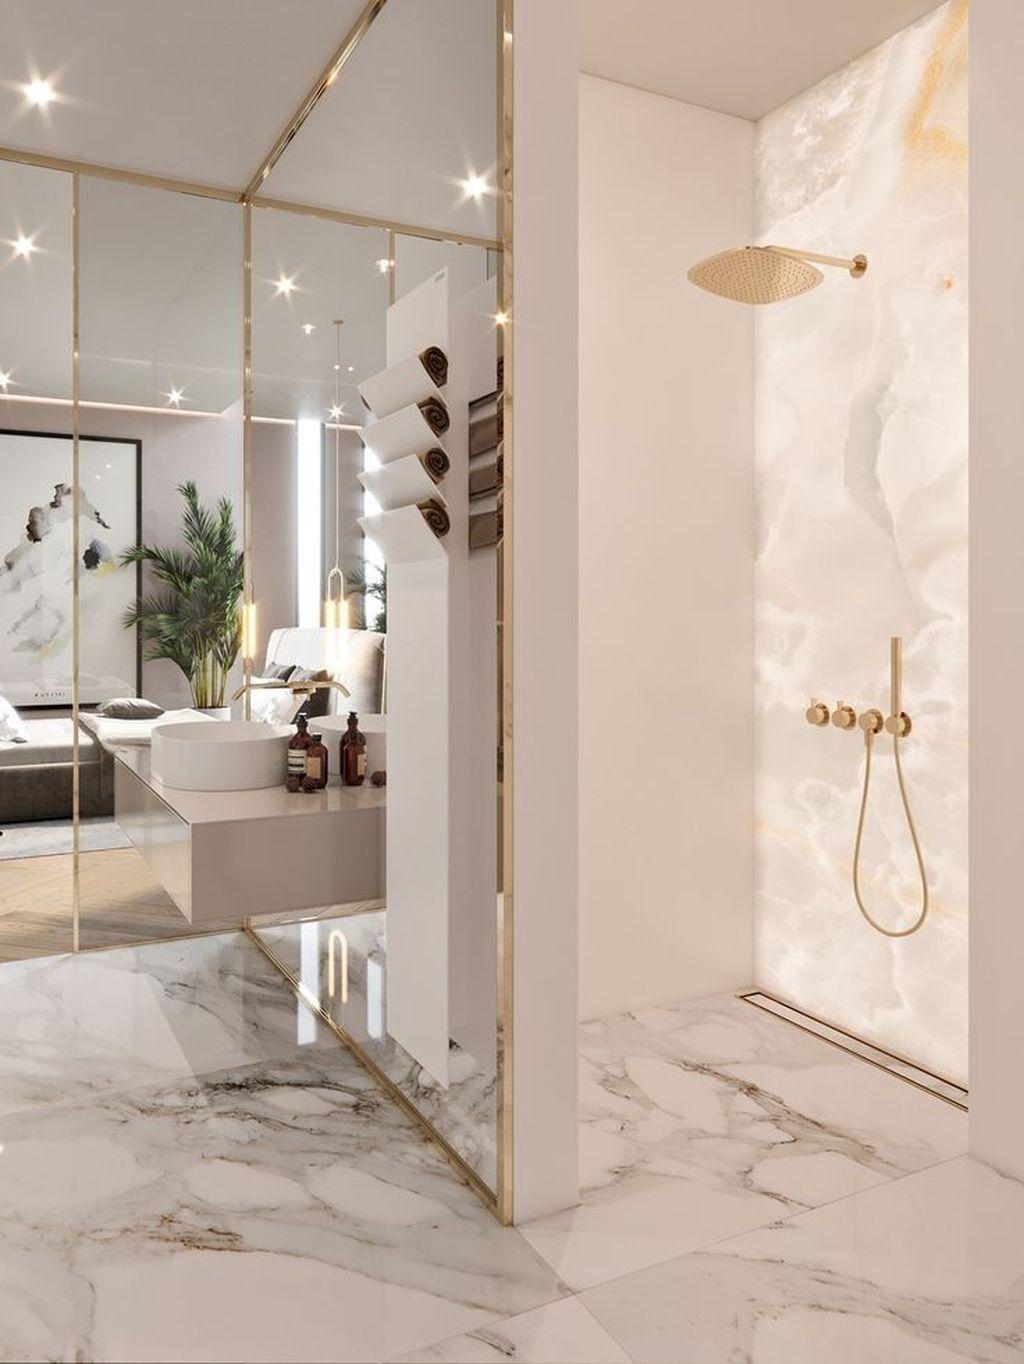 Fabulous Minimalist Bathroom Decor Ideas That Become Everyones Dream 09